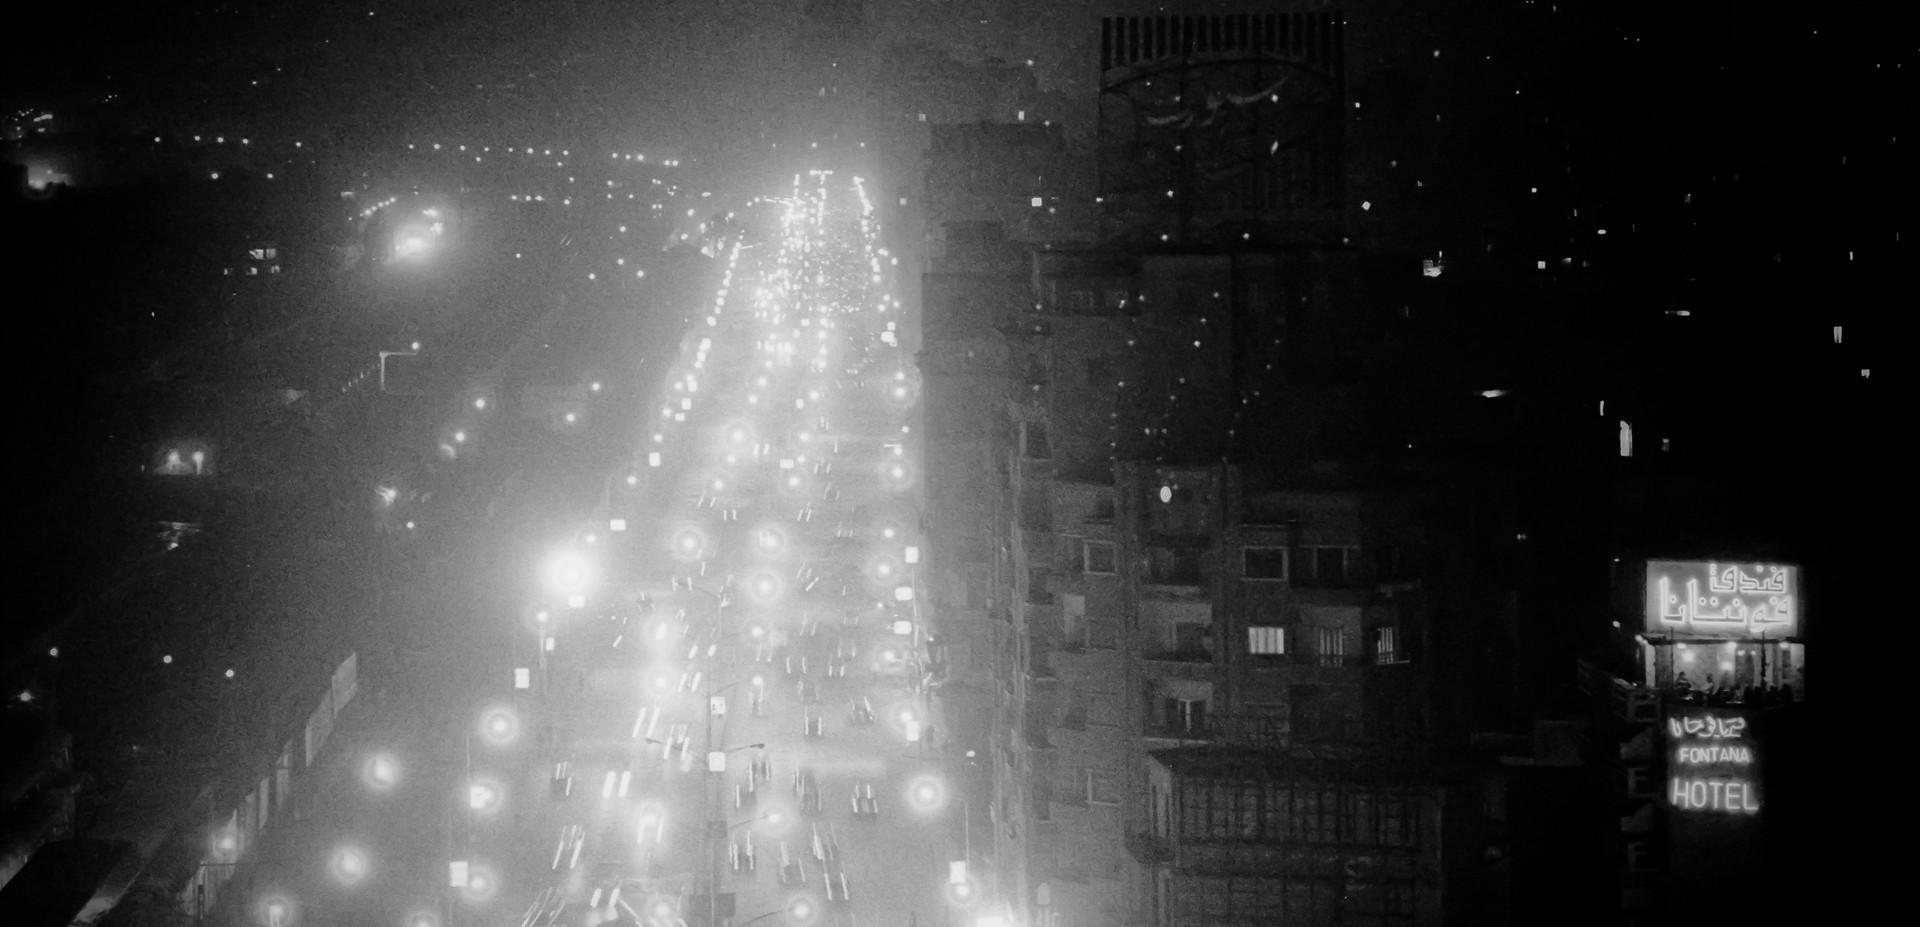 Cairo, Egypt 1981